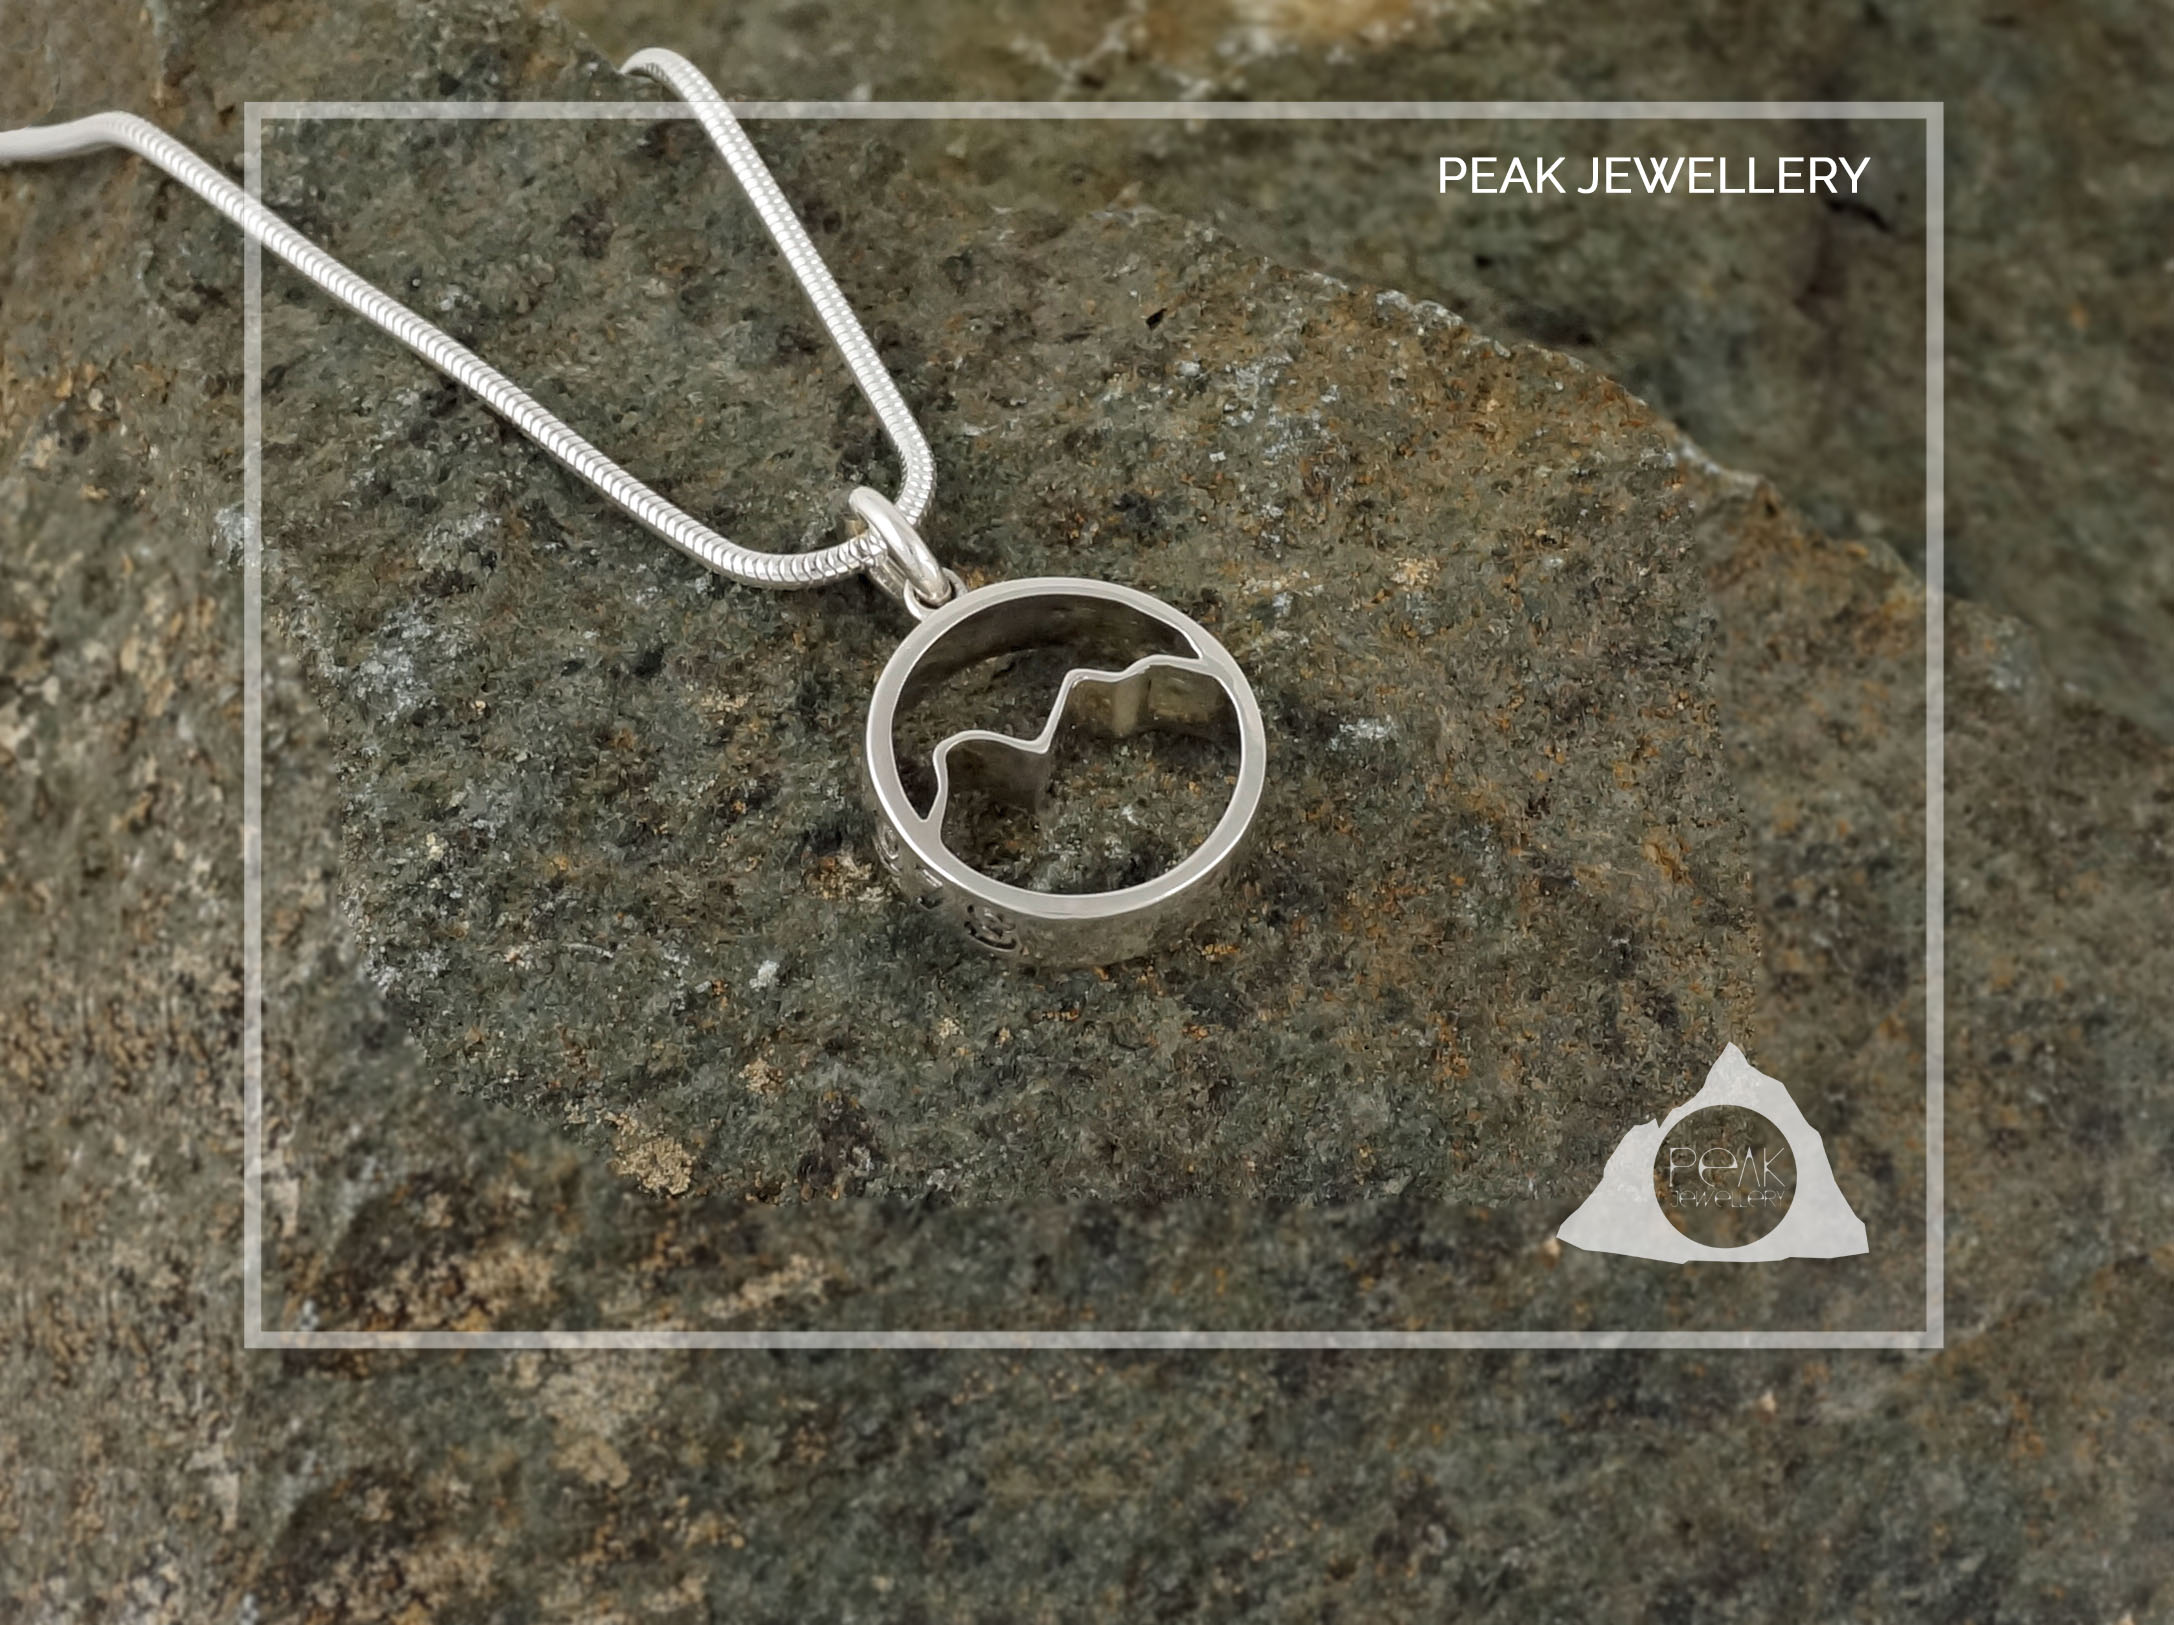 Peak Jewellery, Scafell Pike Mountain Pendant, Handmade Silver adventure jewellery